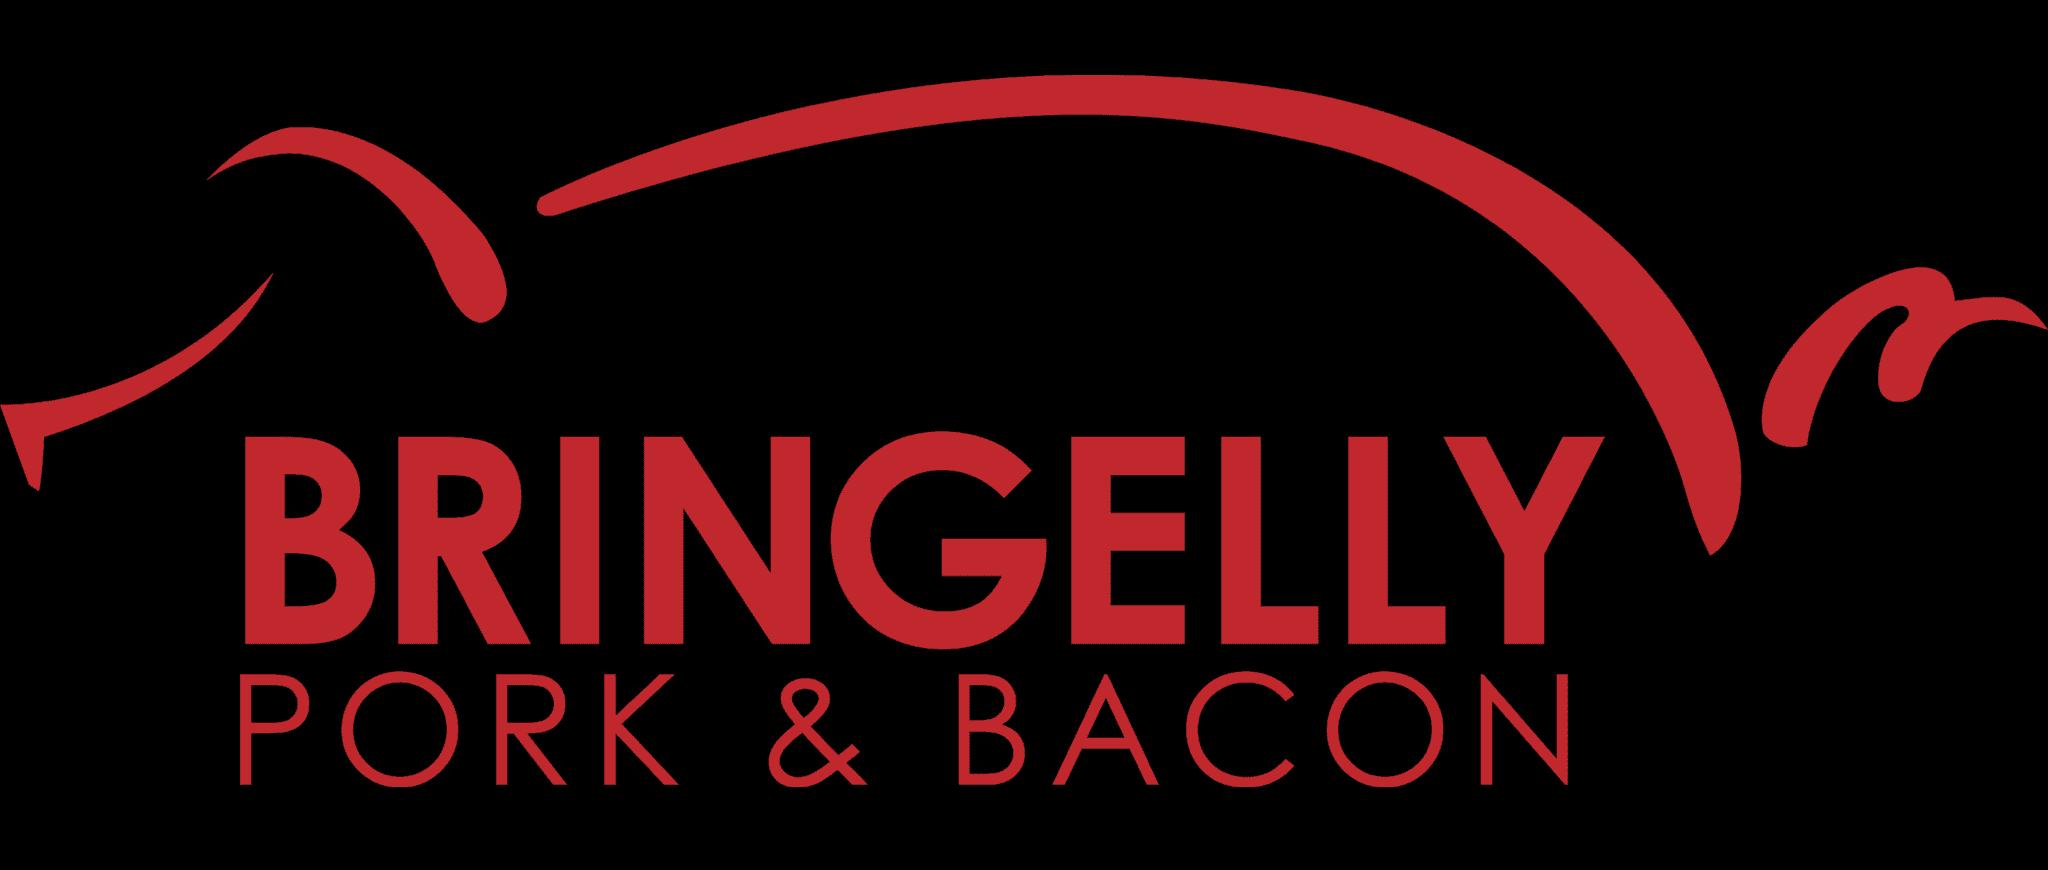 Bringelly Pork and Bacon